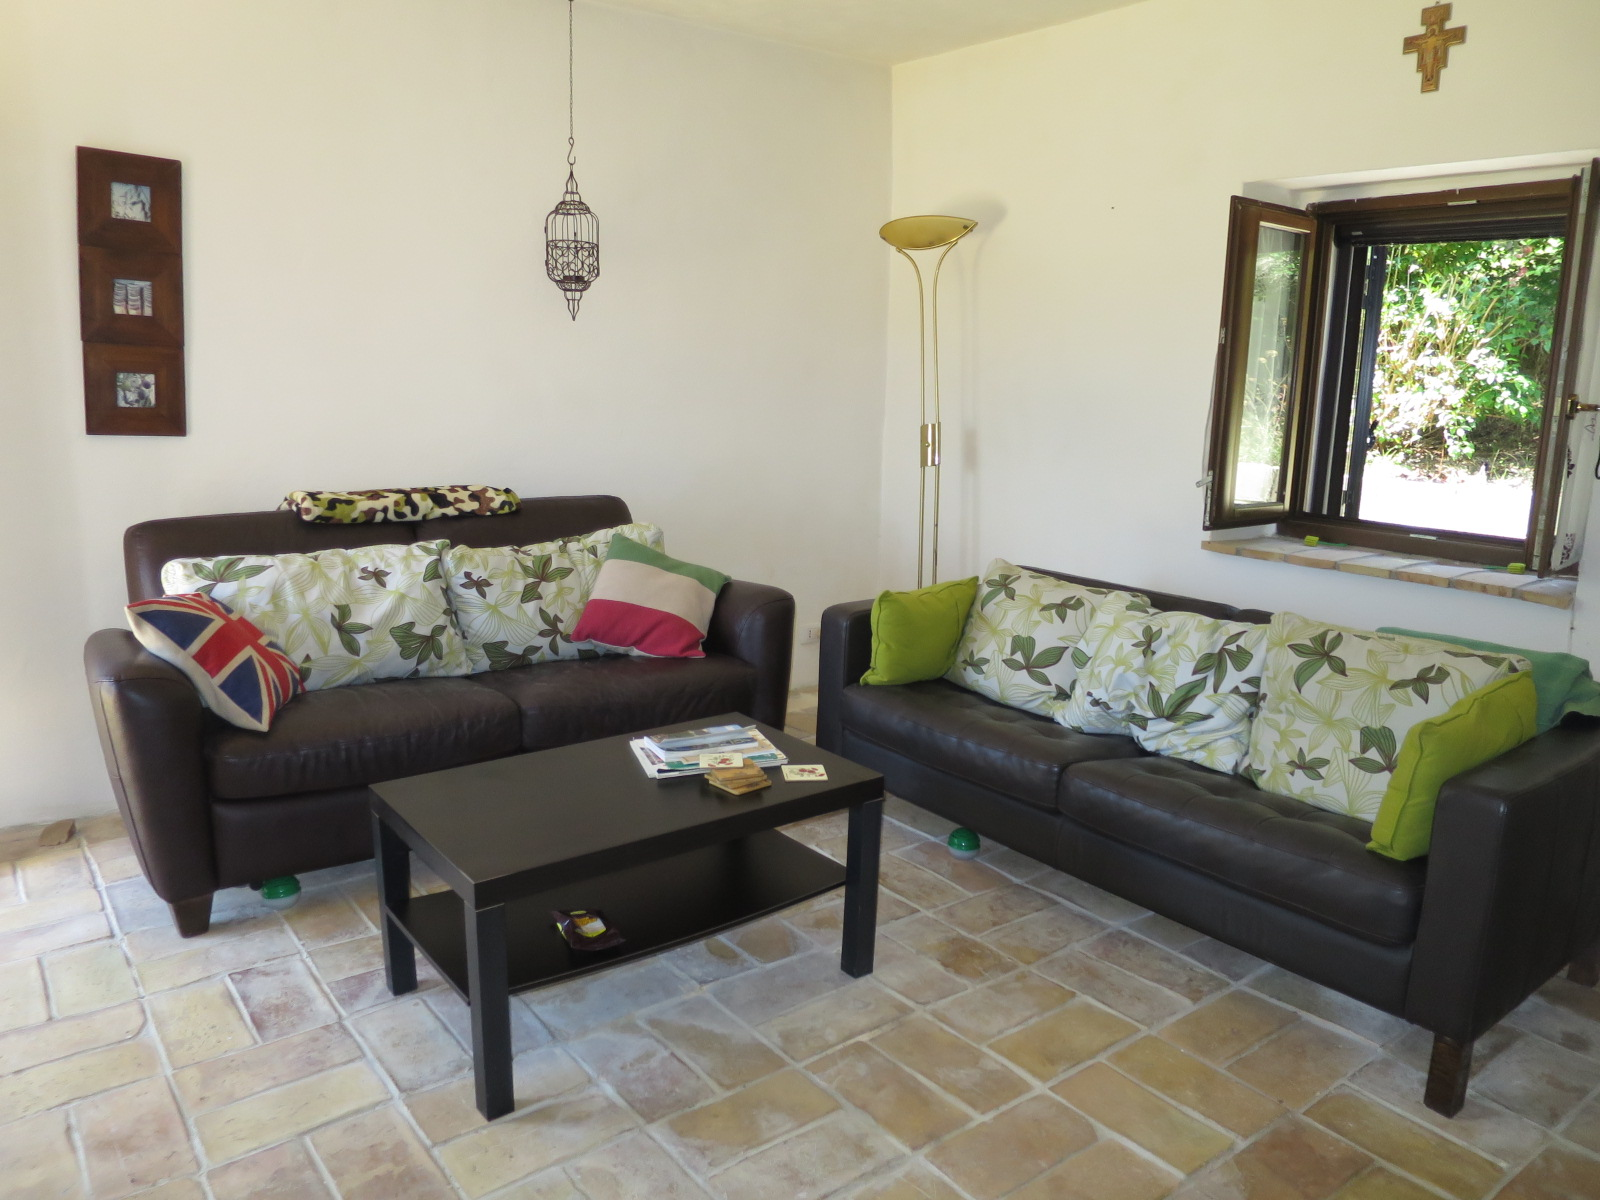 Country Houses Country Houses for sale Montefino (TE), Casa Collina - Montefino - EUR 159.972 330